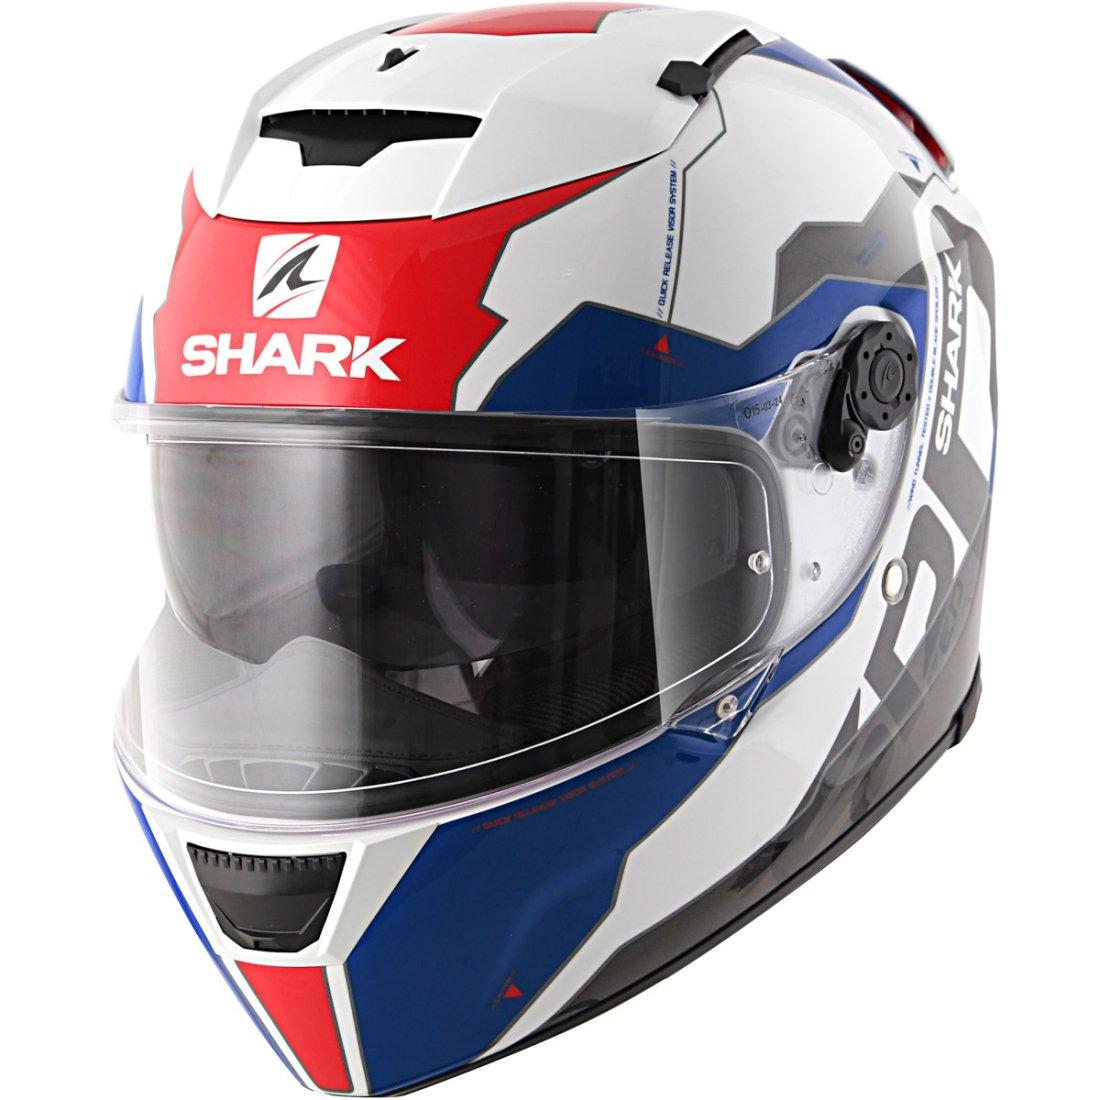 helmet shark speed r series2 sauer ii white blue red motocard. Black Bedroom Furniture Sets. Home Design Ideas